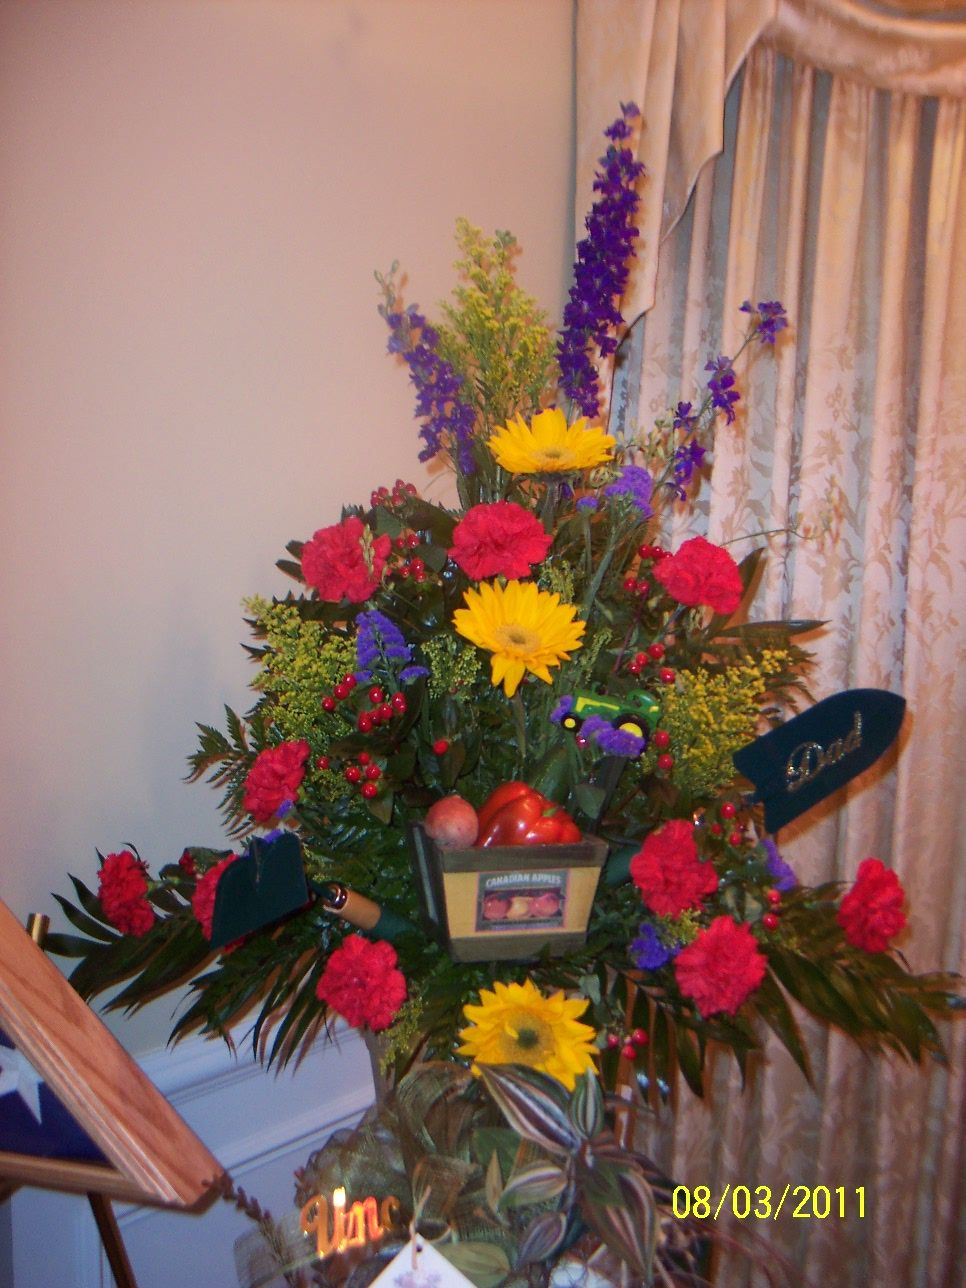 Vase arrangement for a farmers funeral sympathy flowers vase arrangement for a farmers funeral vase arrangements sympathy flowers funeral flowers farmers izmirmasajfo